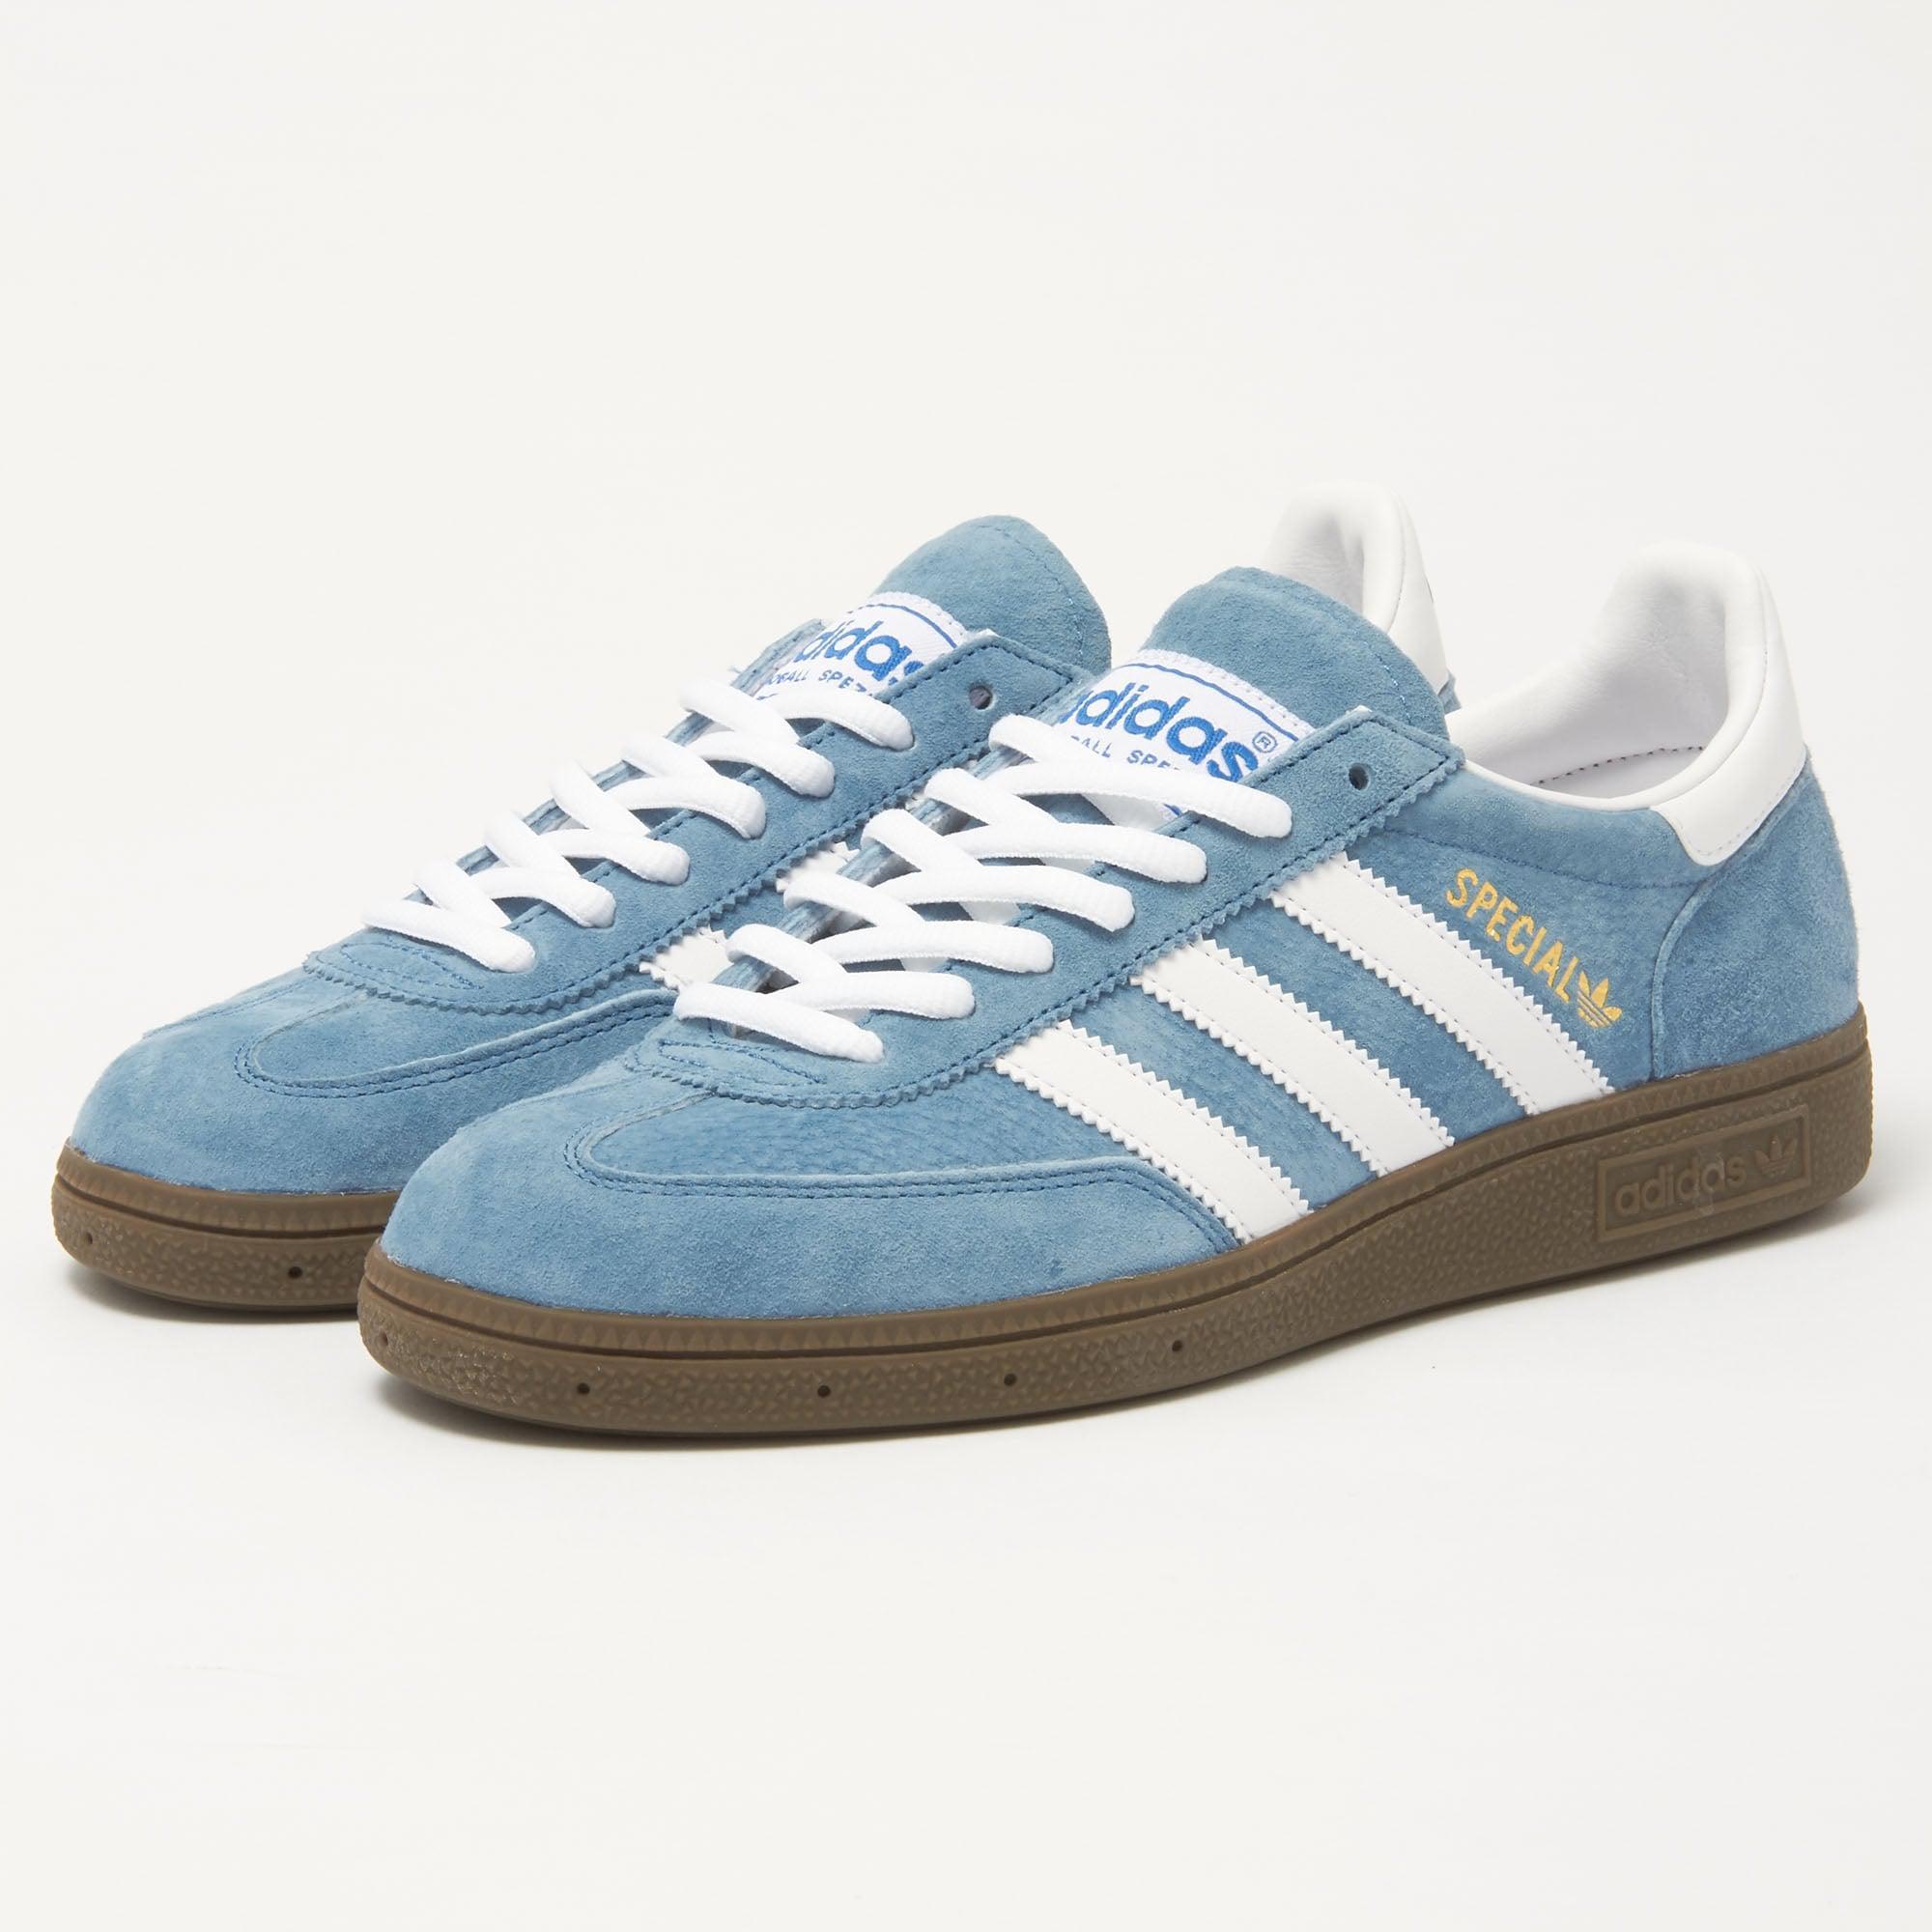 new style 0a1d3 1cfcb Lyst - adidas Originals Adidas Handball Spezial Blue Sneaker